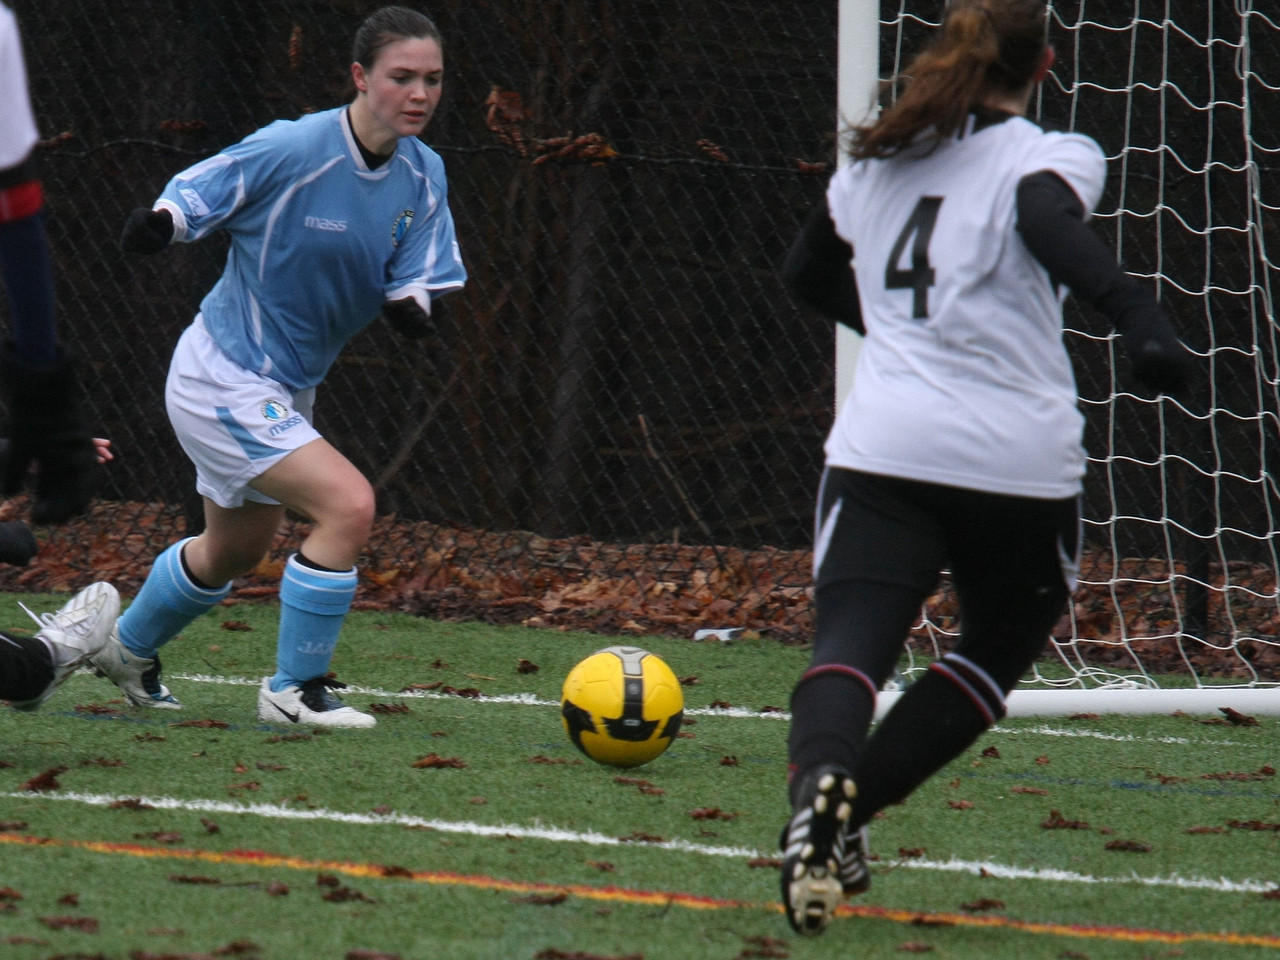 IMG4_9790 Kristin goal seq COE Soccer Scorpion Bowl trmzb